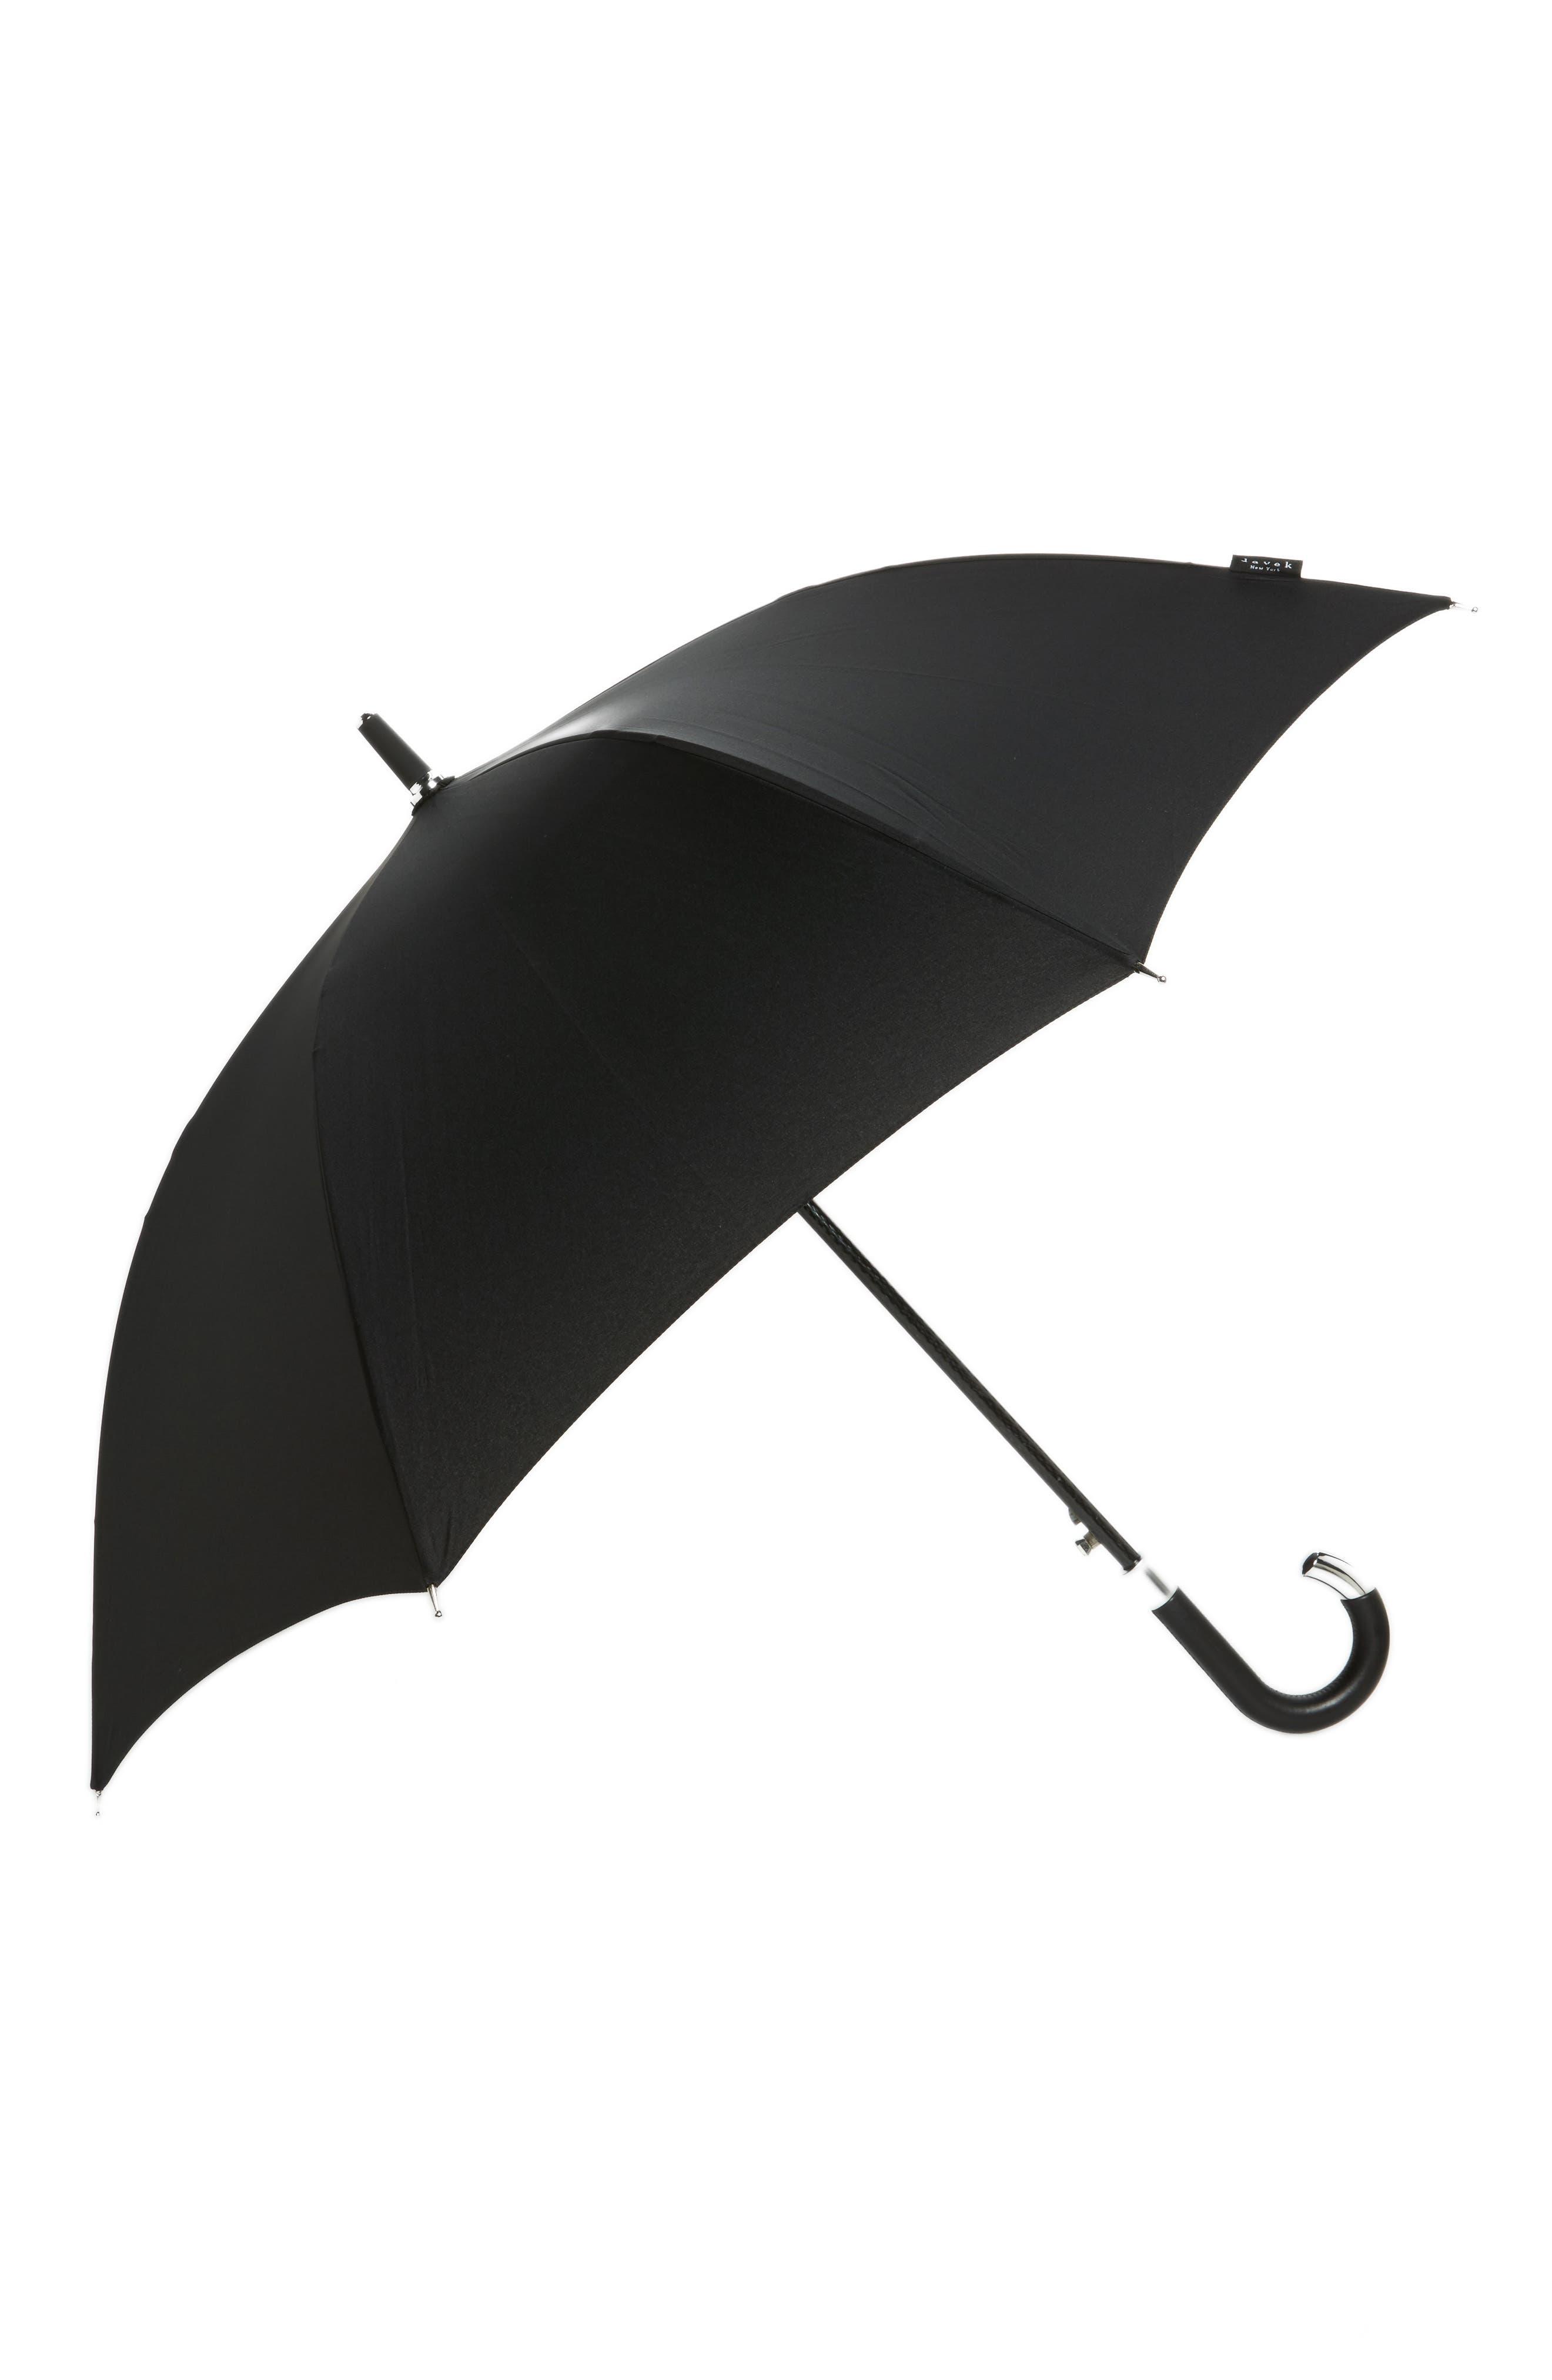 DAVEK Elite Cane Umbrella - Black